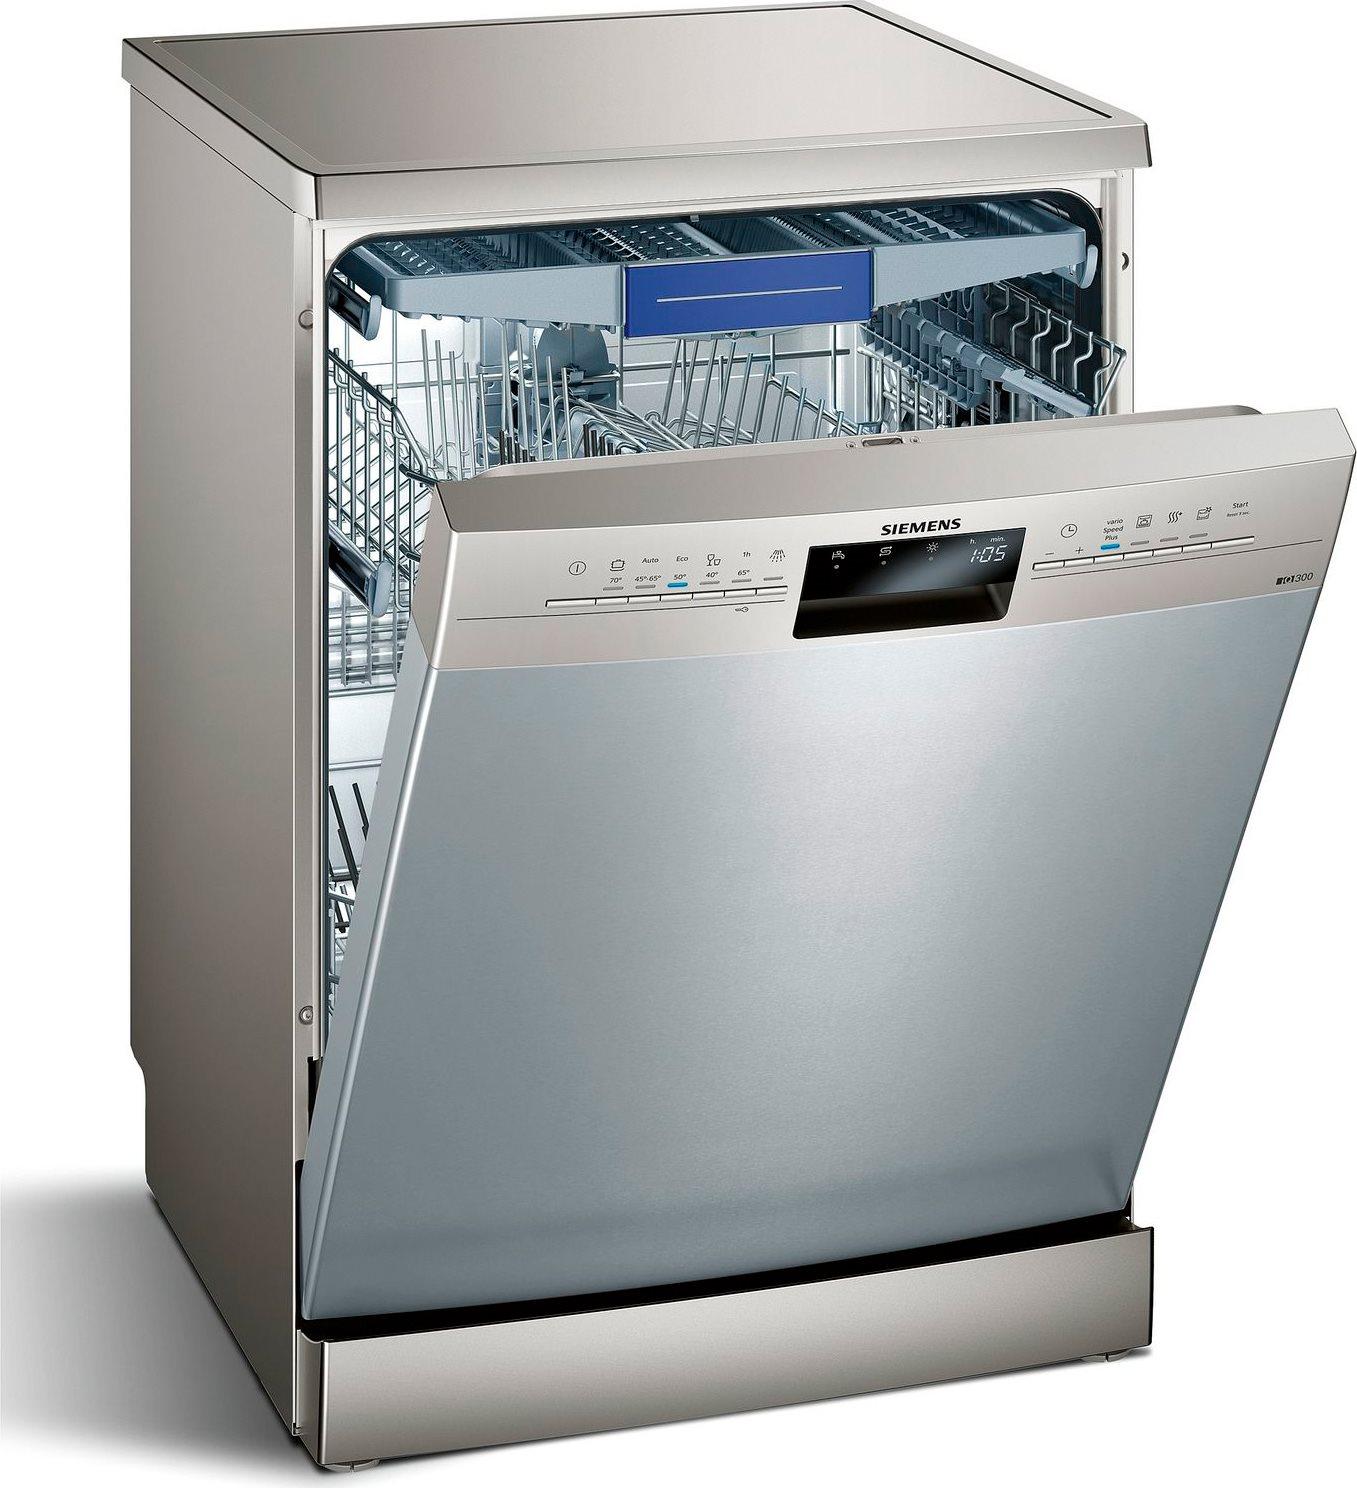 Lavastoviglie Siemens Sn236I03Me Iq300 Offerte Lavastoviglie E ...